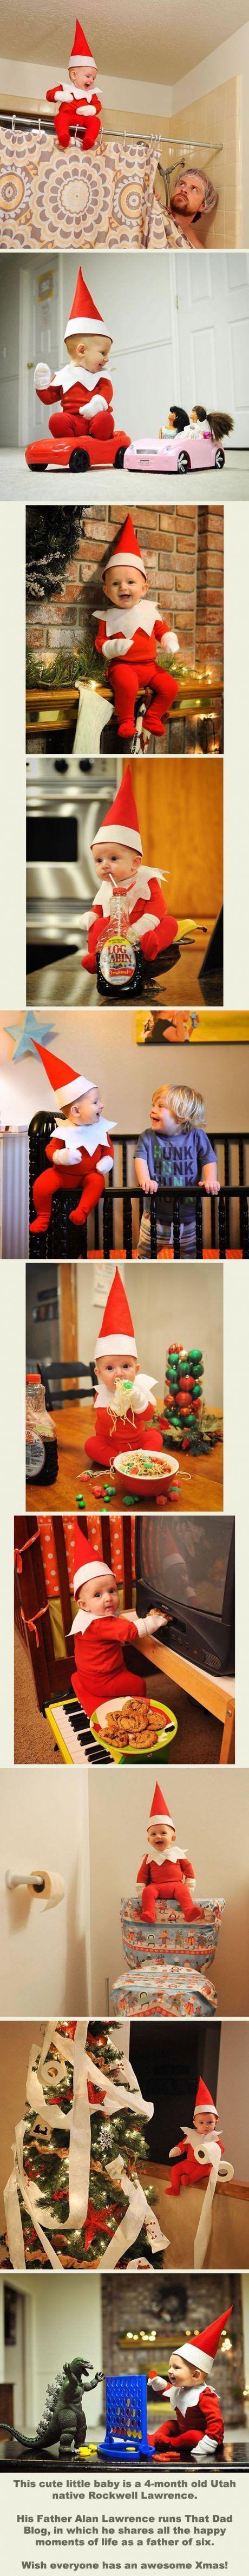 2289 best Christmas images on Pinterest